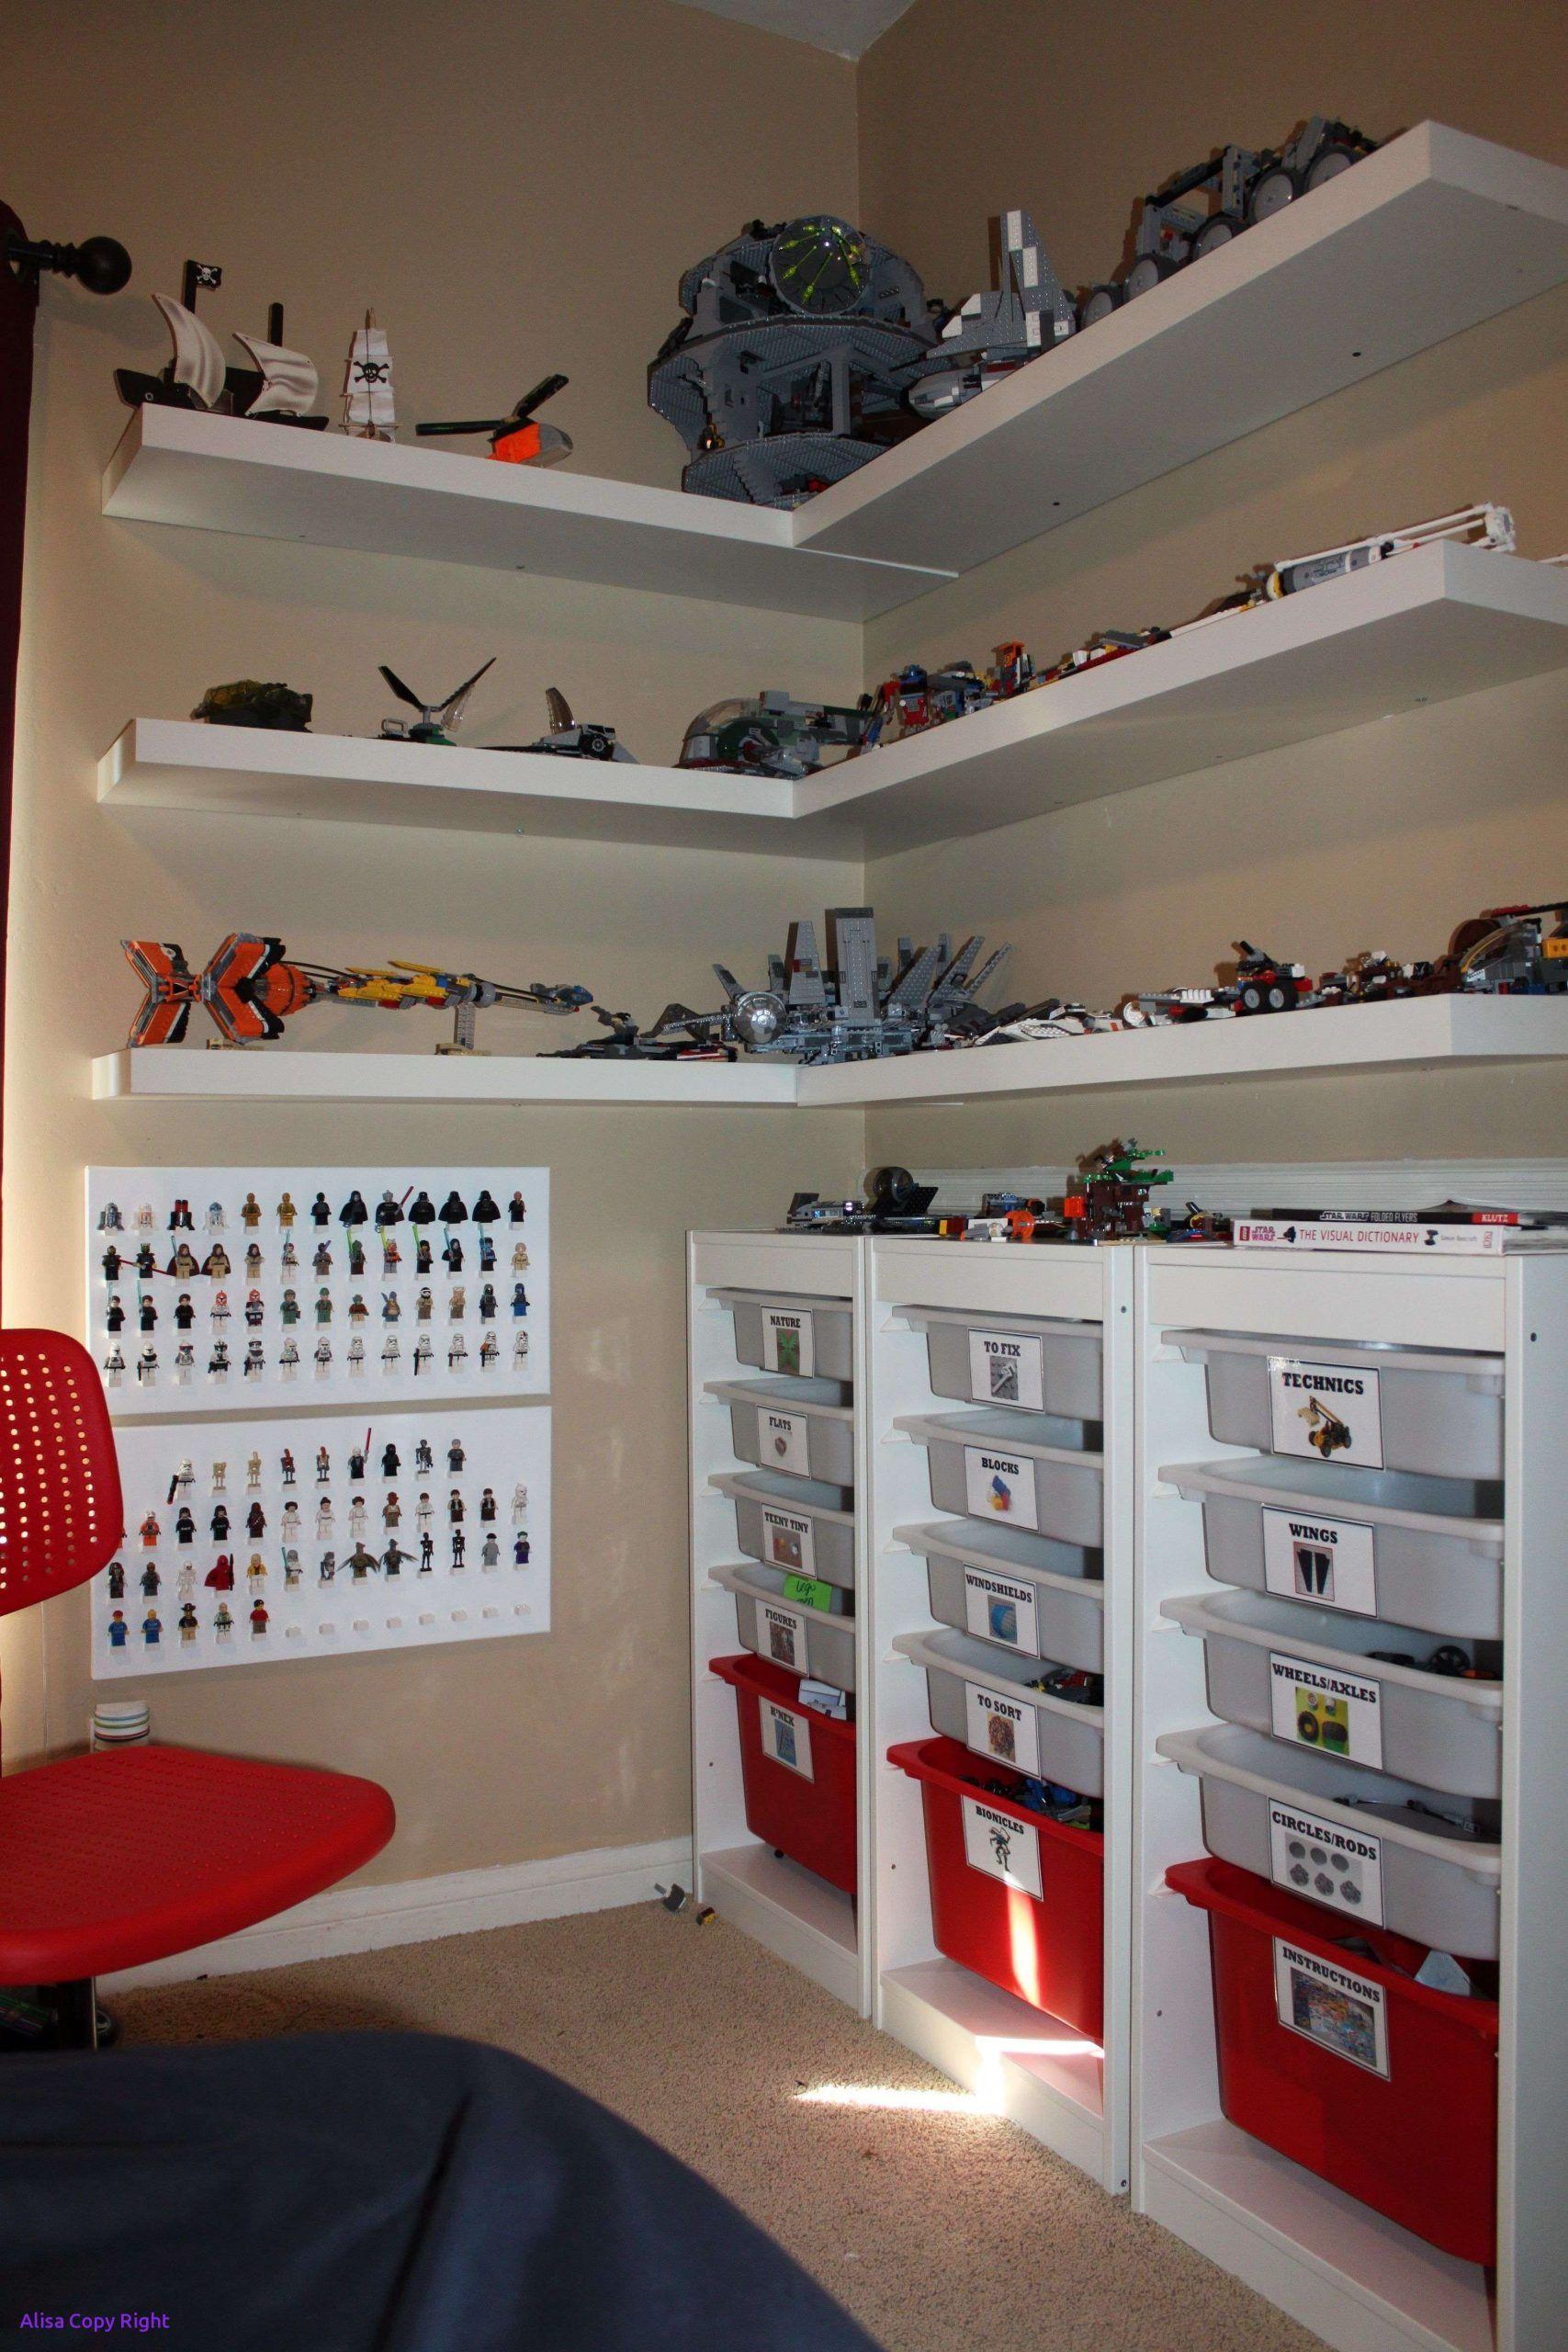 Lego Playroom Ideas  #homedecoration #homedecorations #homedecorationideas #home...#home #homedecoration #homedecorationideas #homedecorations #ideas #lego #playroom